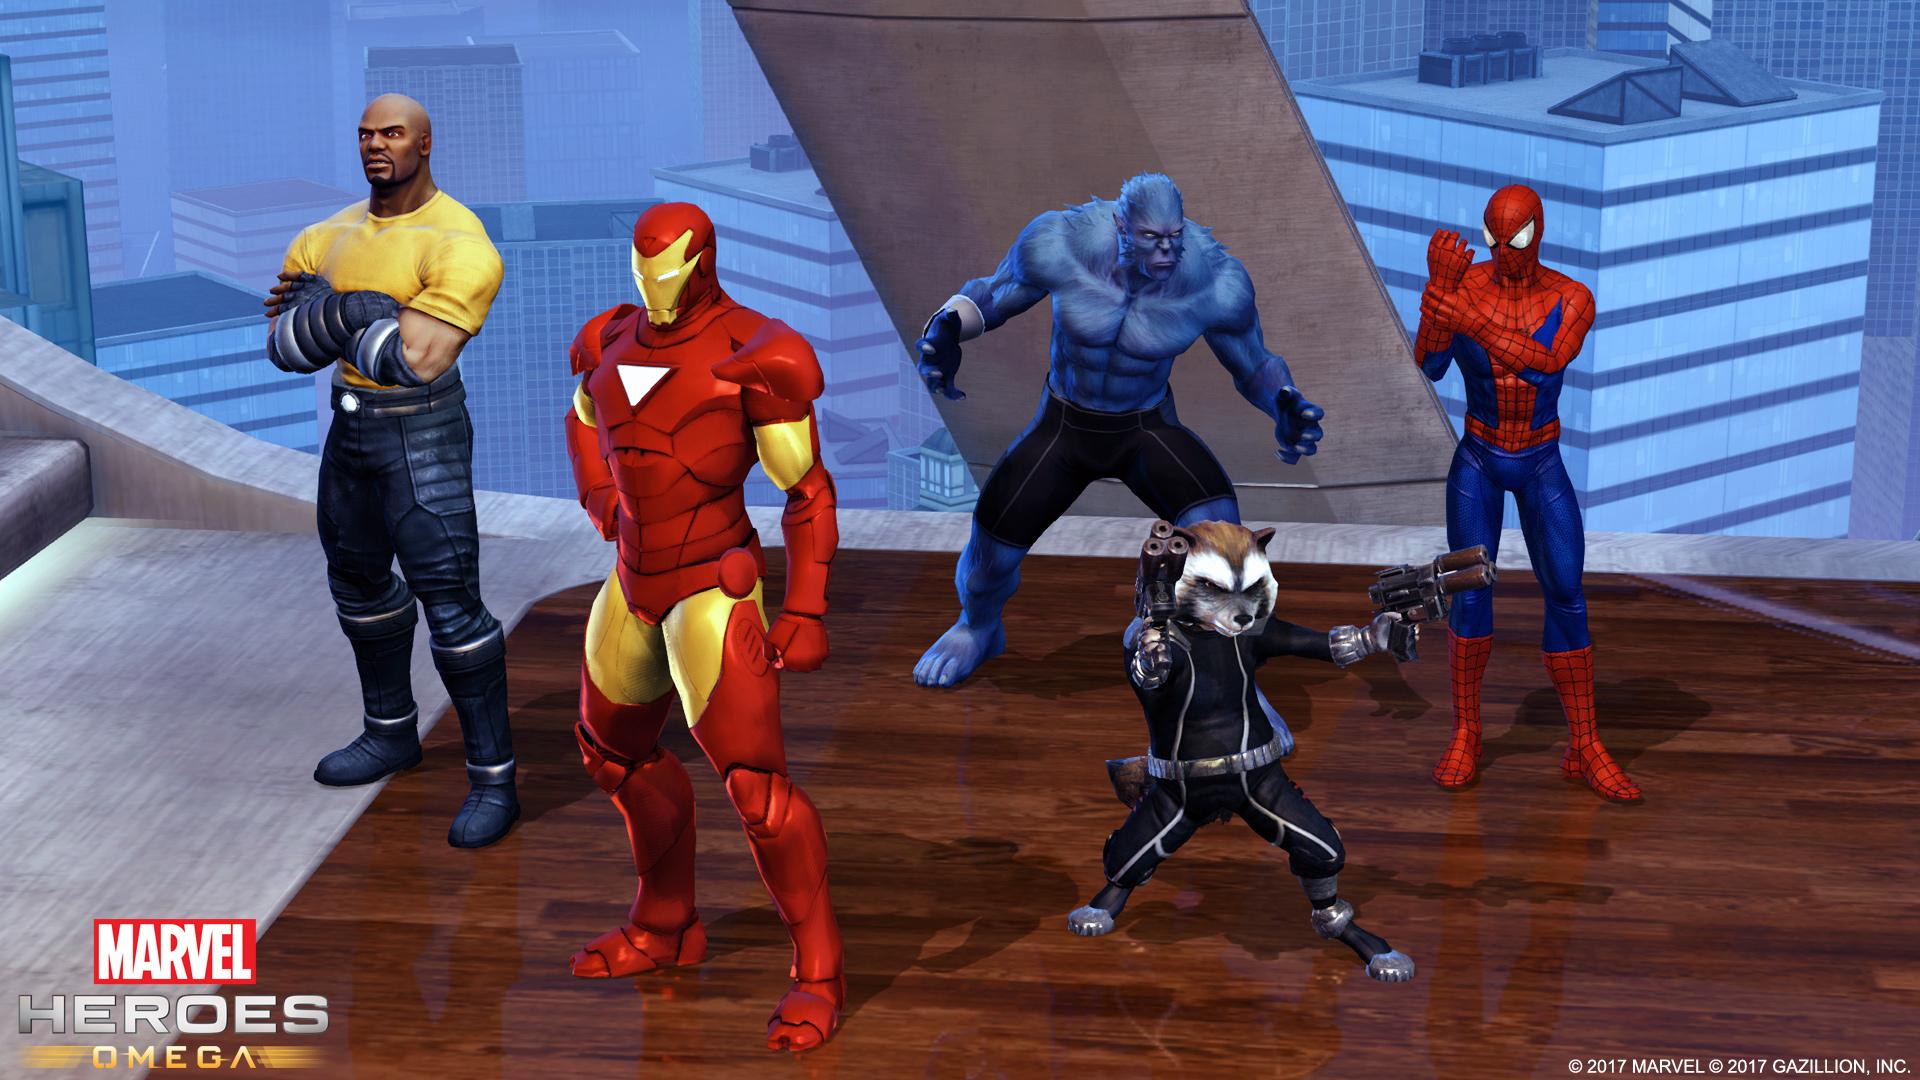 Marvel Heroes Omega Enters Open Beta On PlayStation 4